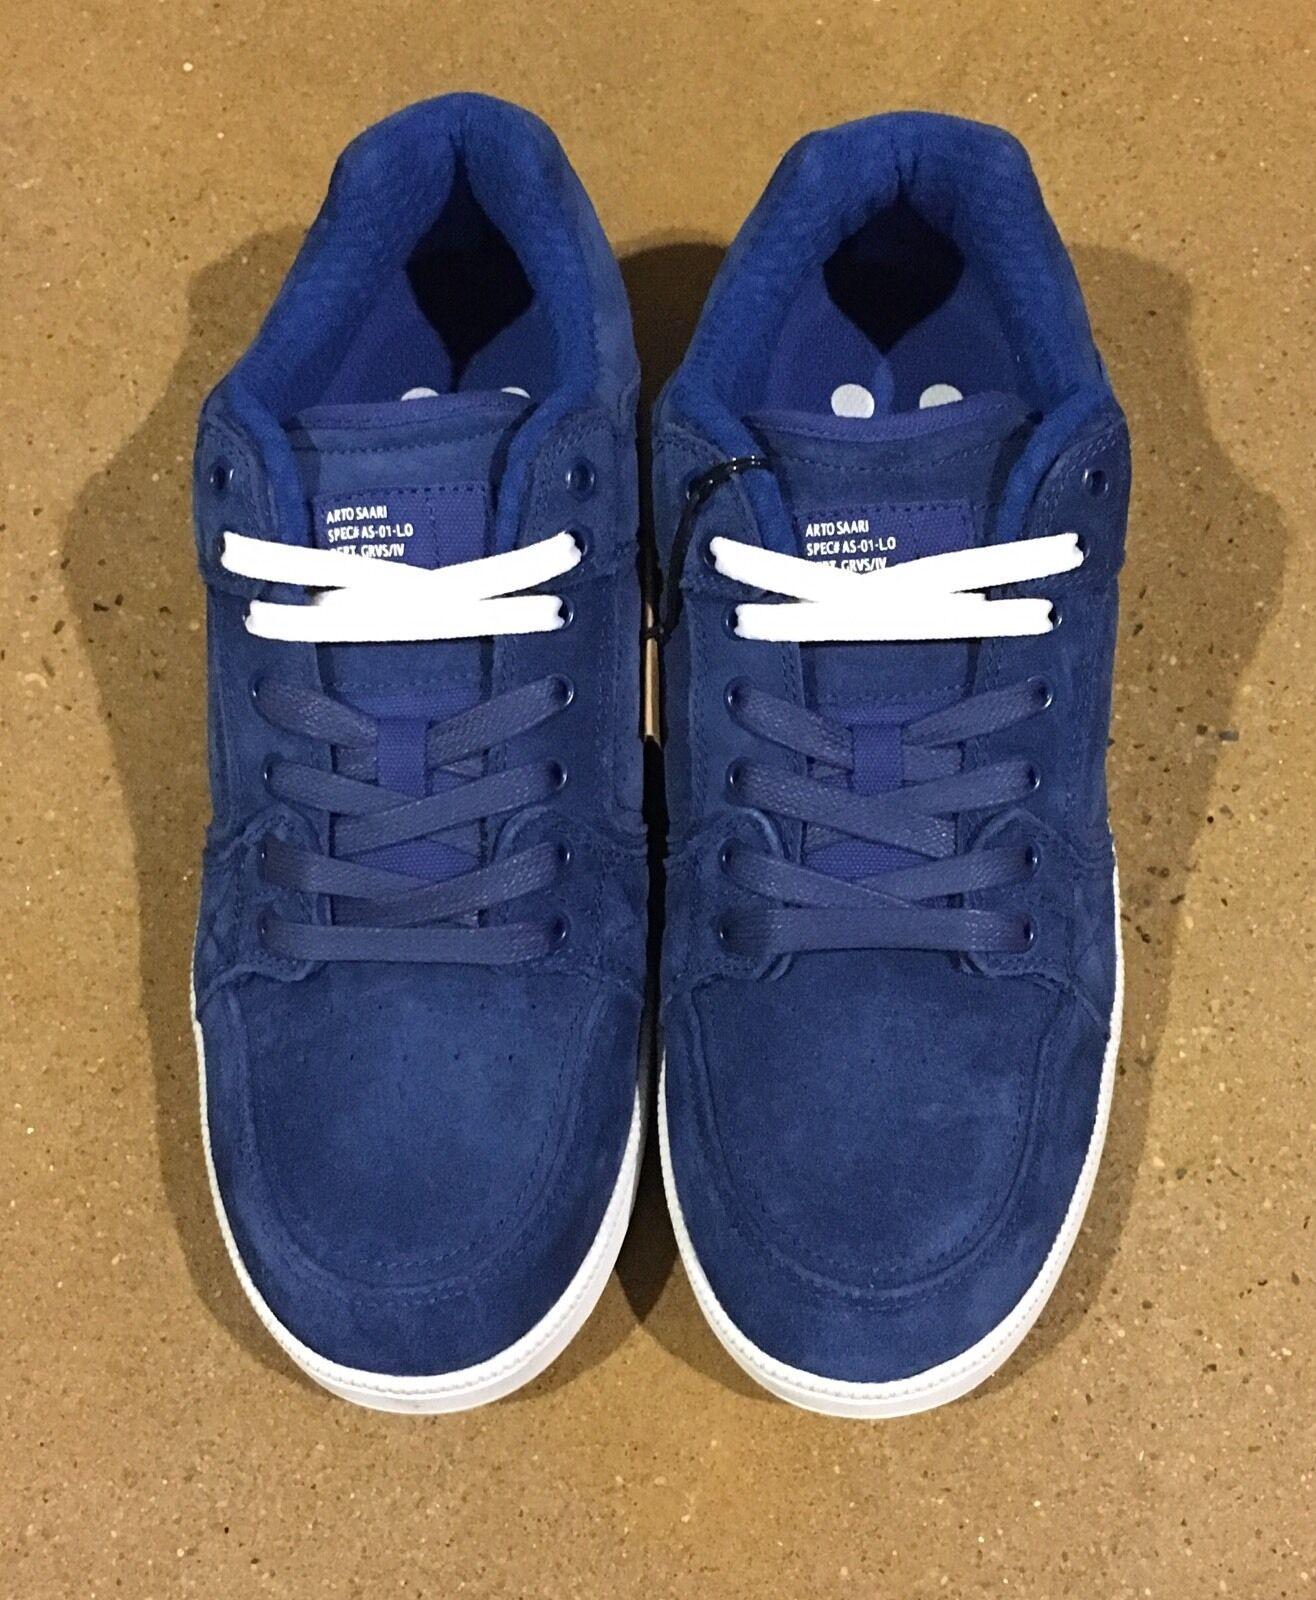 Gravis Viking Arto Saari Size 8 US True Blue Burton BMX DC Skate Shoes Deadstock